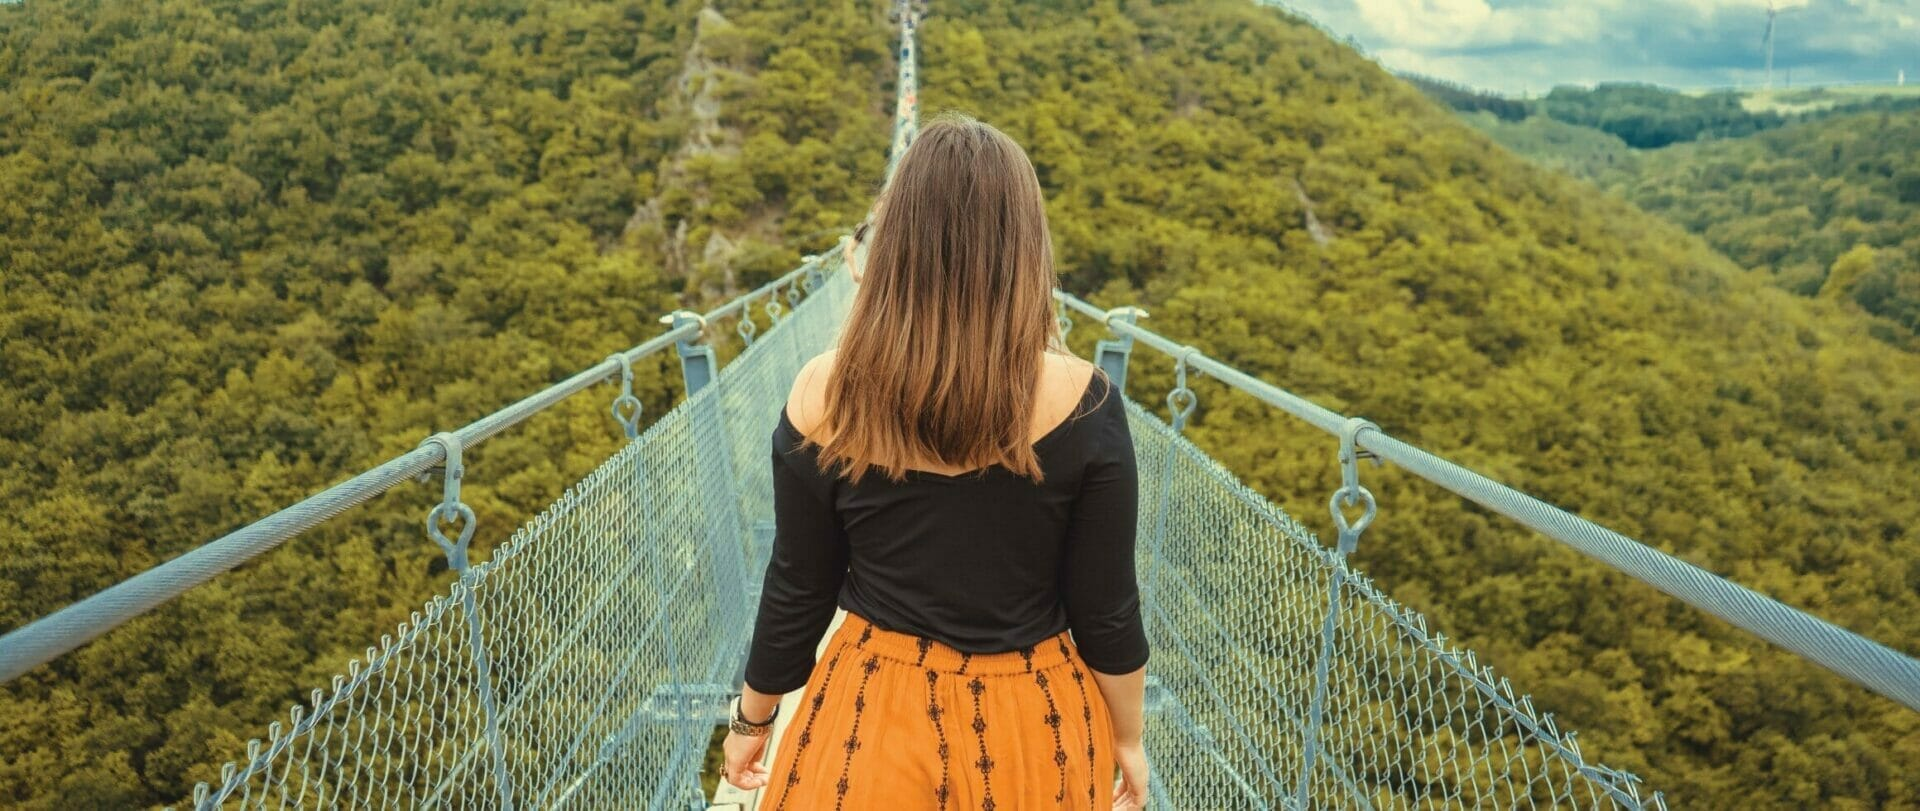 Reach your international travel dreams